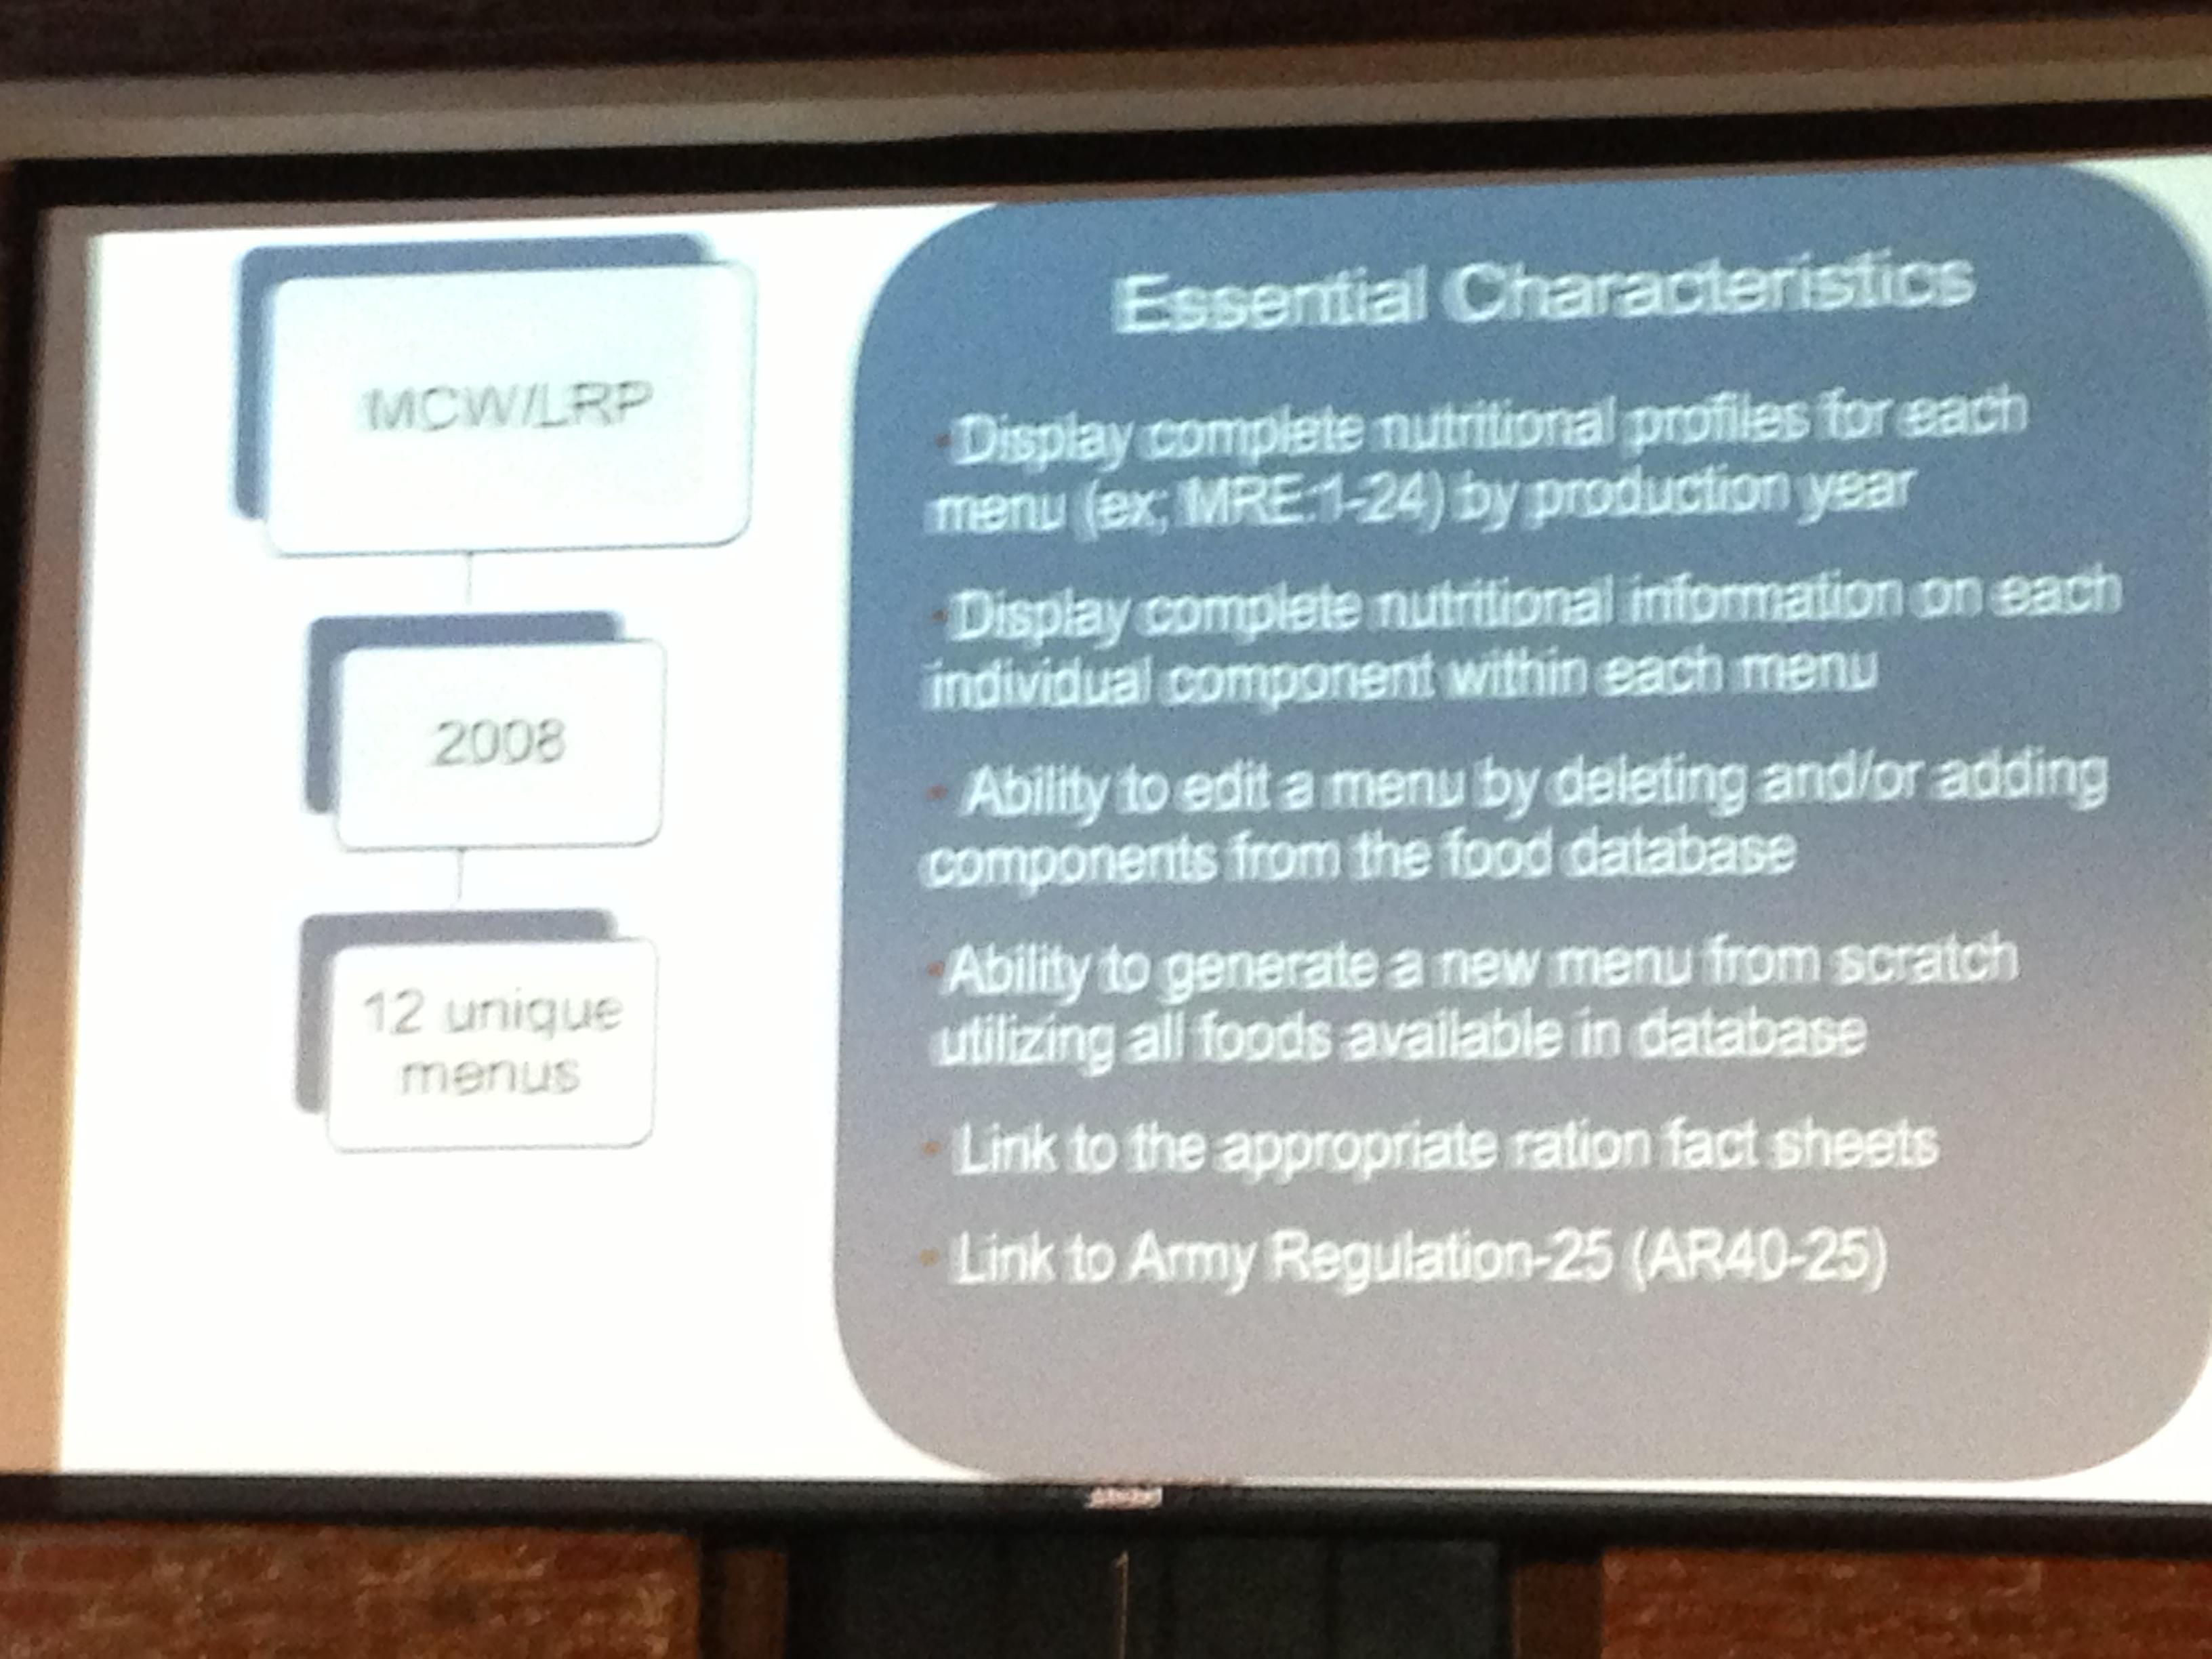 essentialcharacteristics copy.JPG